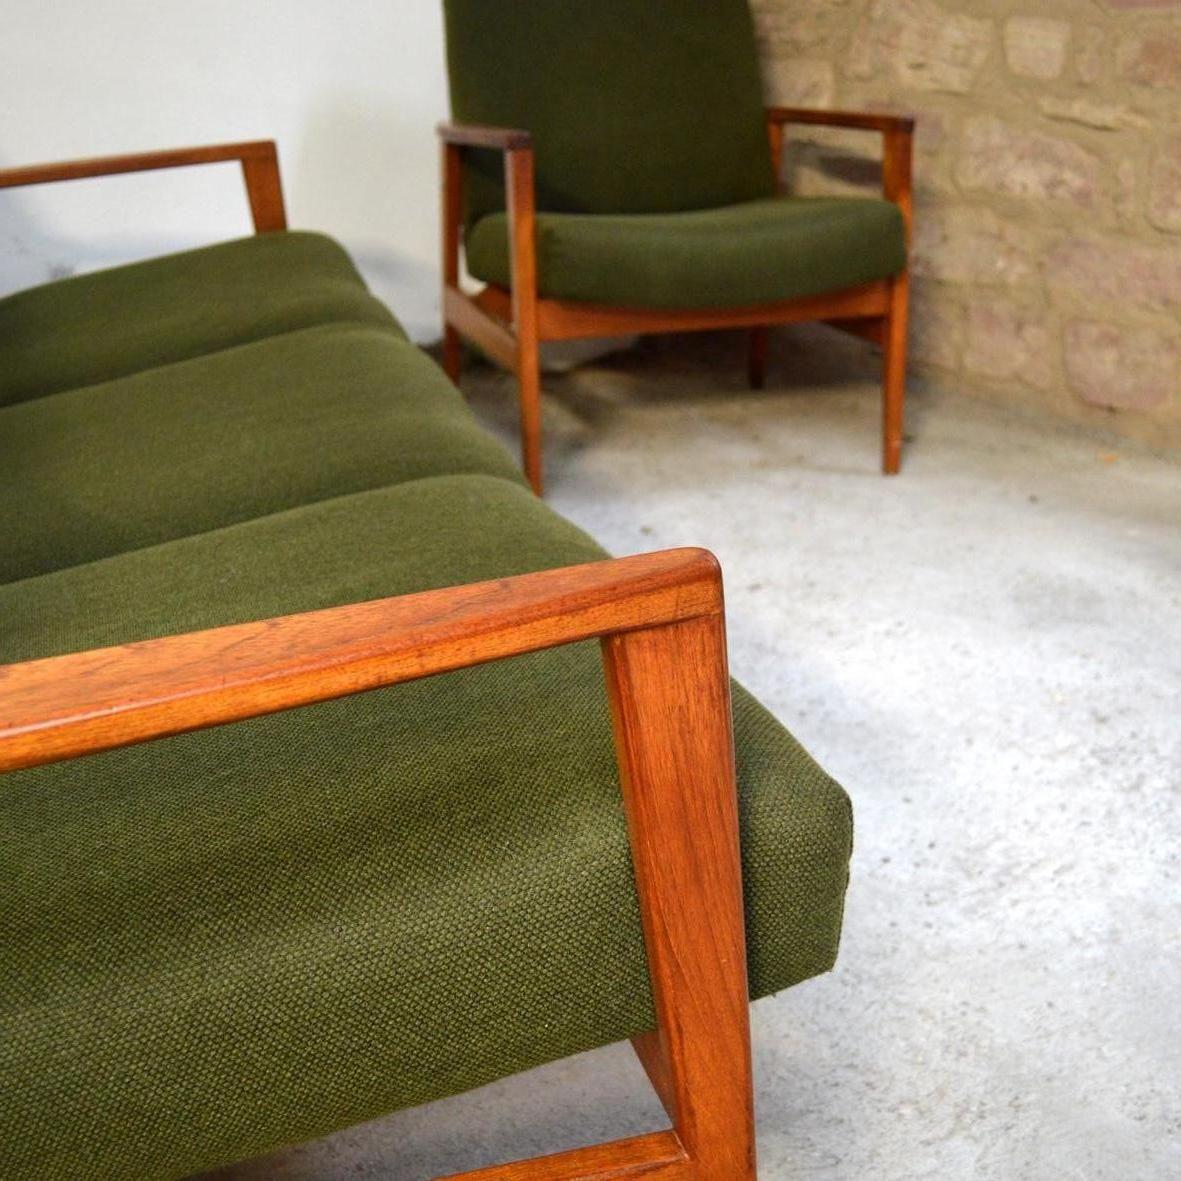 mobilier de salon vintag en teck scandinavie en vente sur pamono. Black Bedroom Furniture Sets. Home Design Ideas